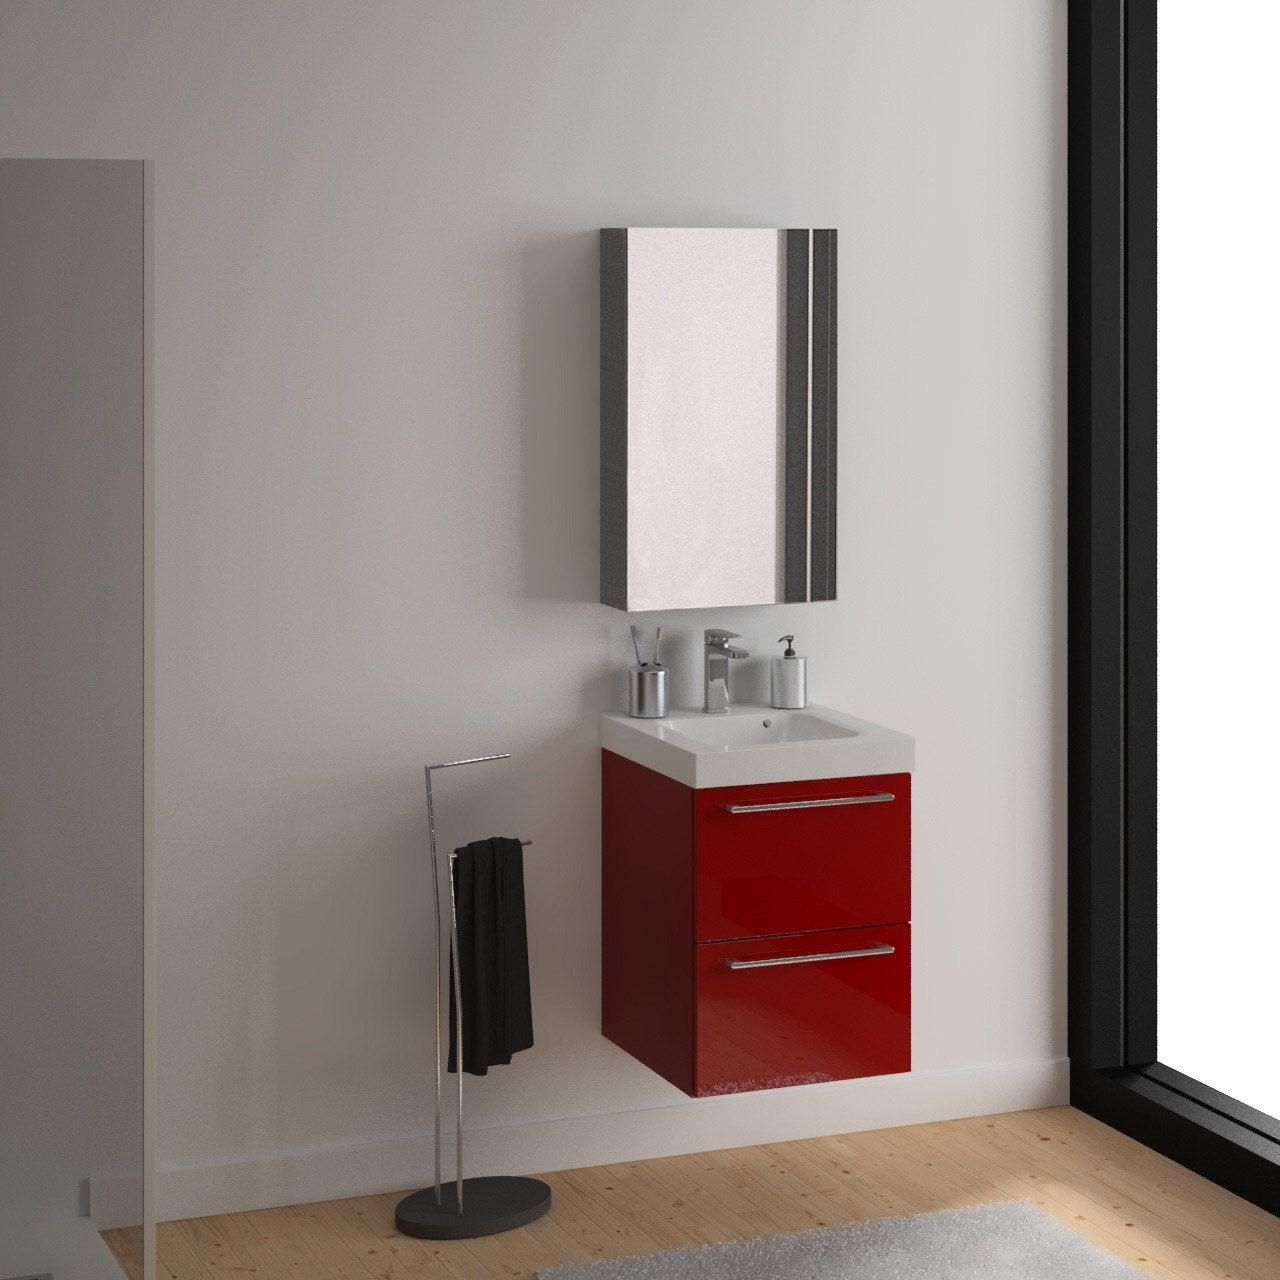 Meuble salle bain rouge - Deco salle de bain rouge ...